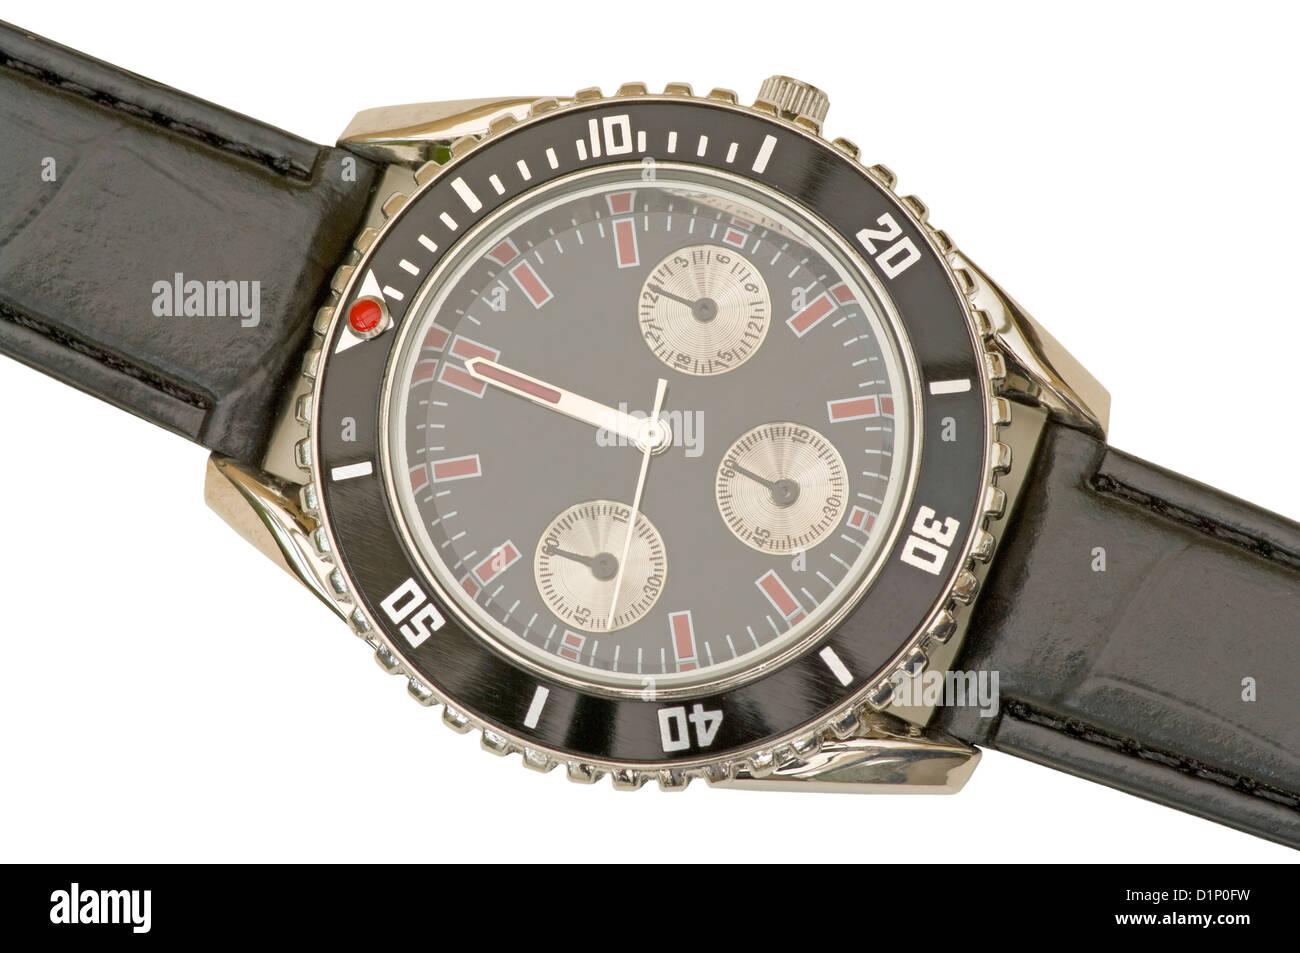 Mans Wristwatch Showing 12 O'Clock - Stock Image